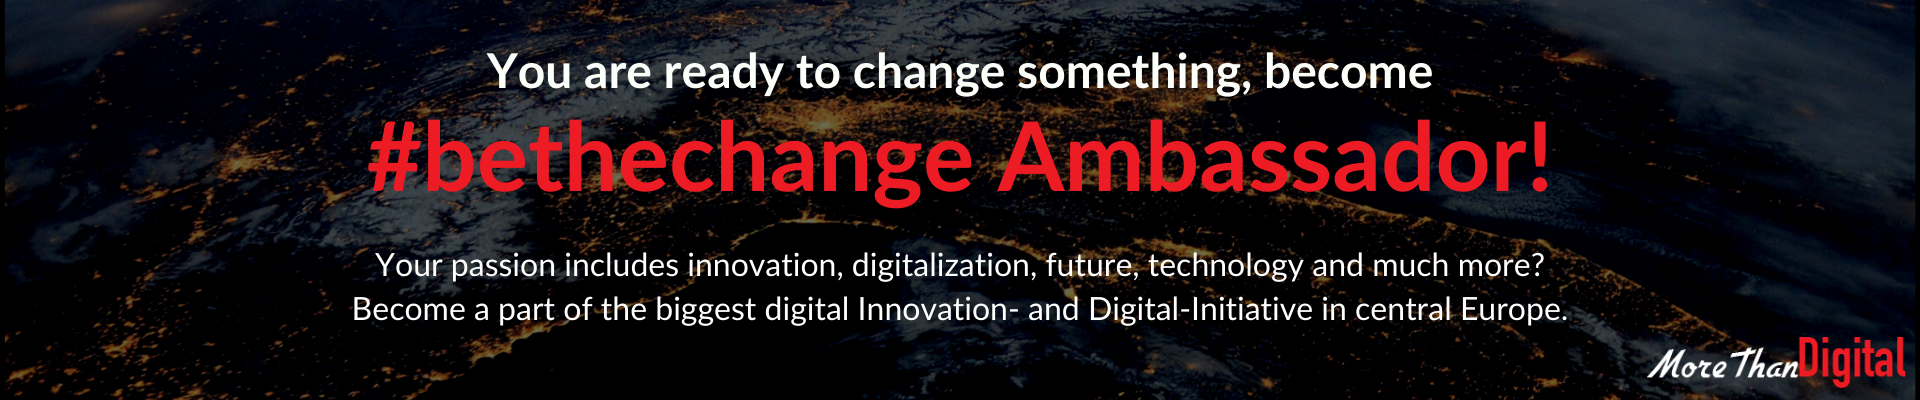 MoreThanDigital #bethechange Ambassador Application 1